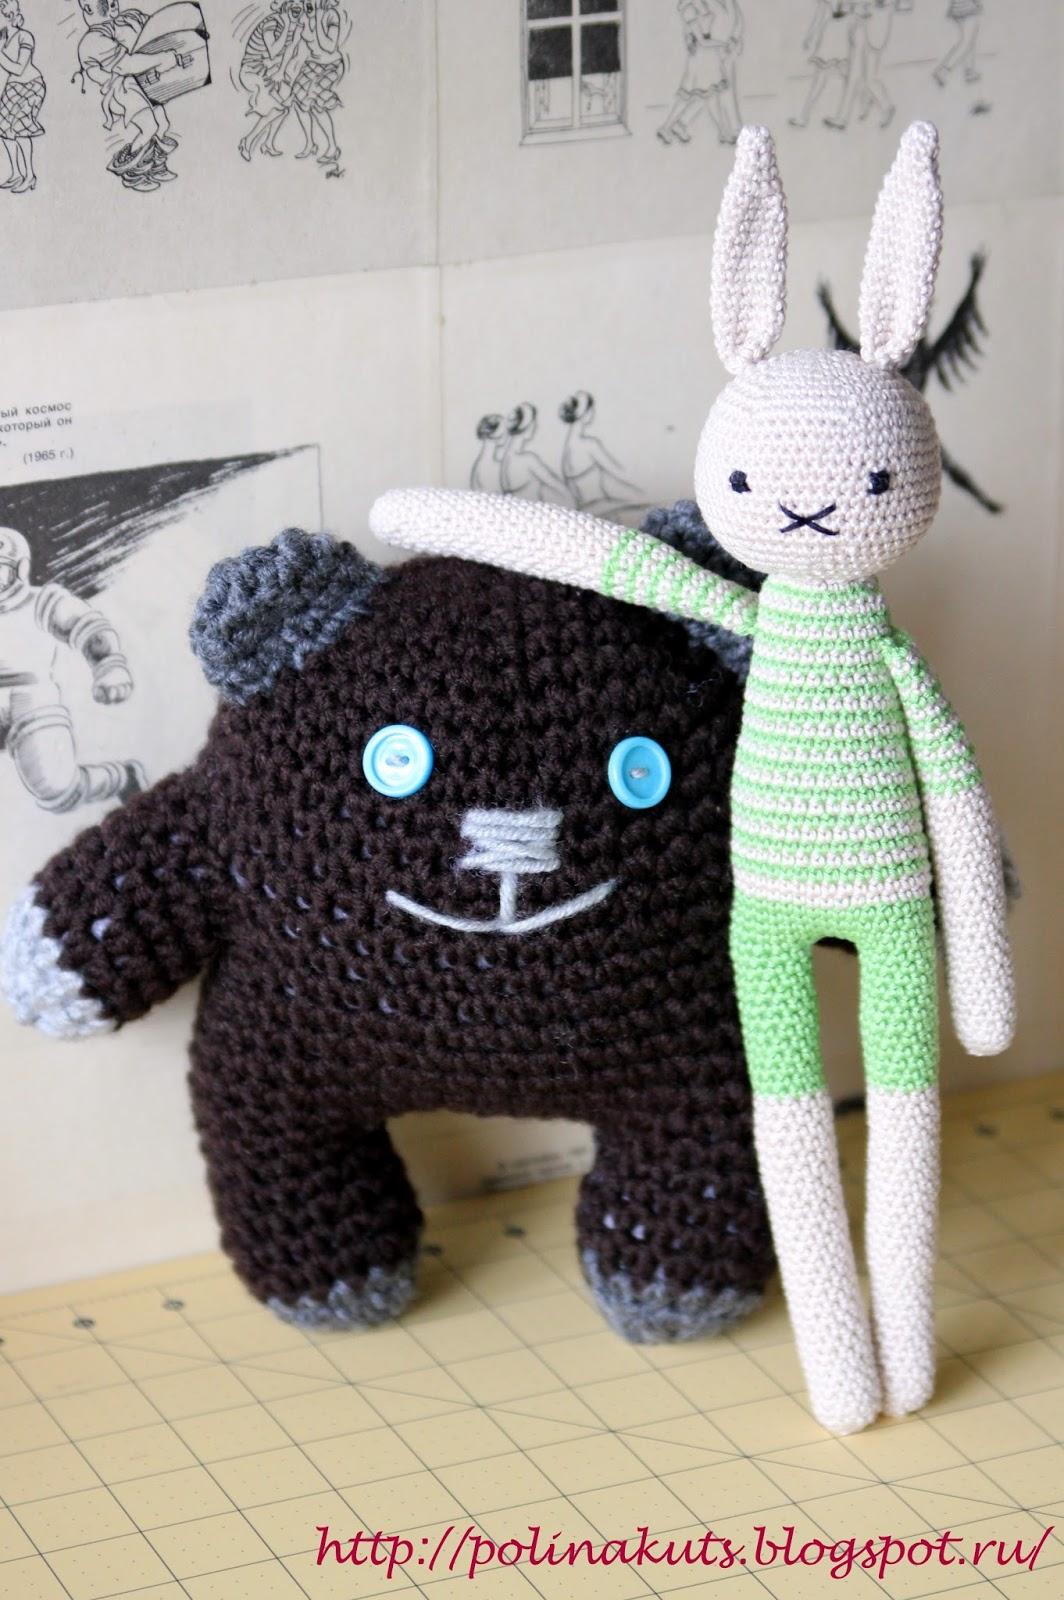 Polina Kuts вязаные игрушки медведь головоног и заяц астеник